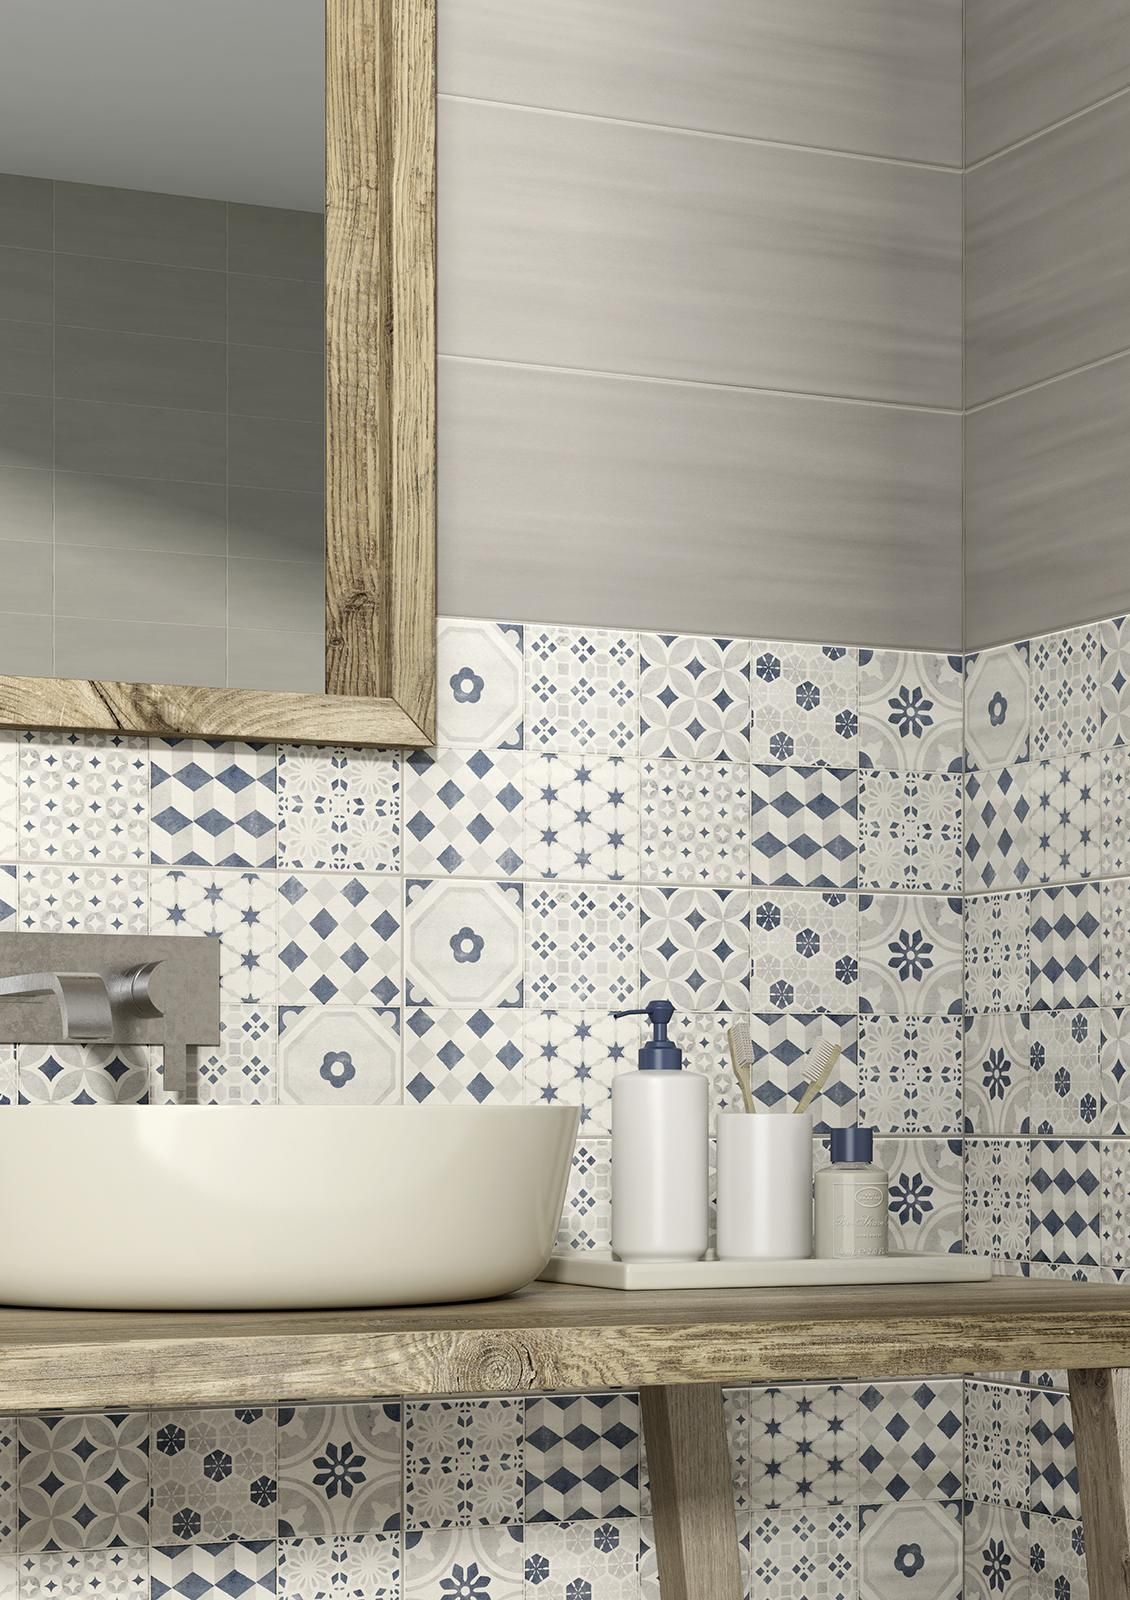 Sanitairsupershop Inspiratie Marazzi Paint Tegels Badkamer Woonkamer Vloertegels Wandtegels Sho Bathroom Wall Tile Small Bathroom Decor Tile Bathroom